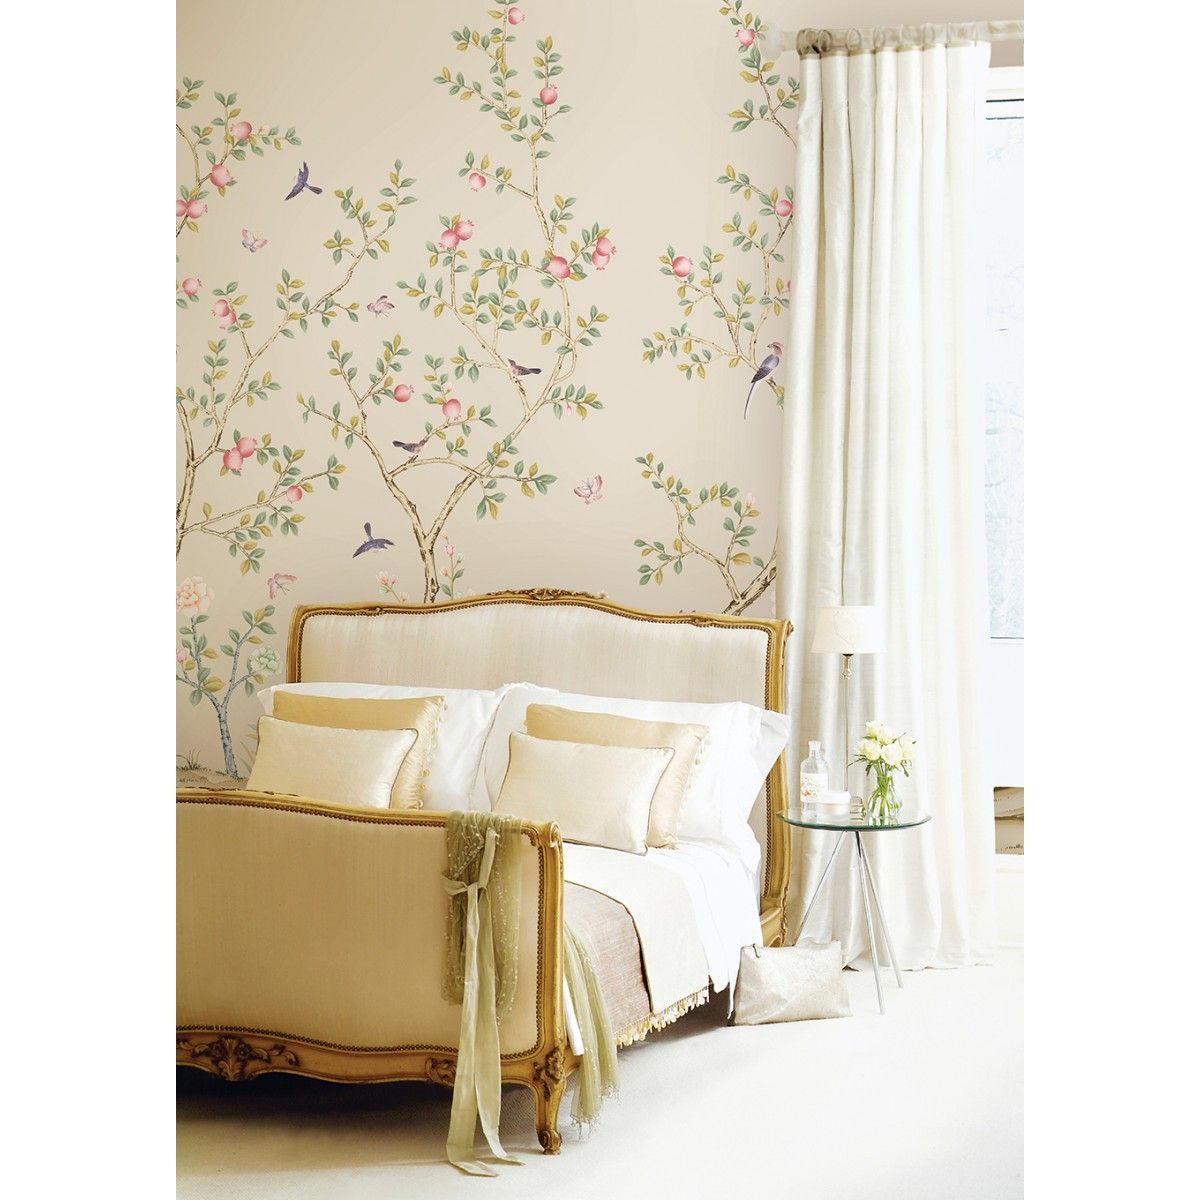 CHINOISERIE Pomegranate Sand Bedroom design, Bedroom